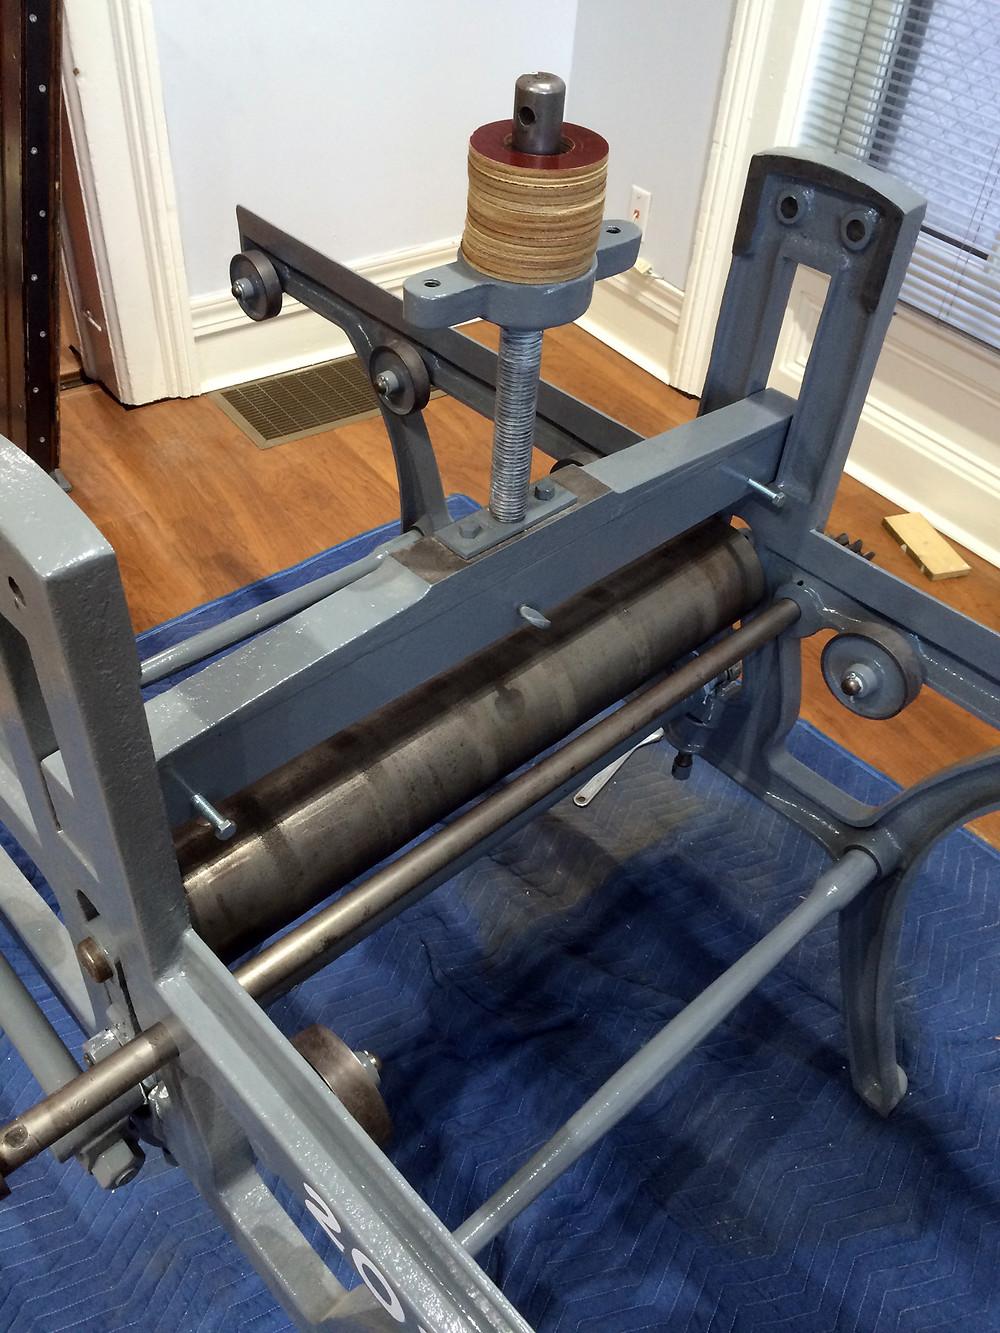 assembling-a-litho-press6.jpg